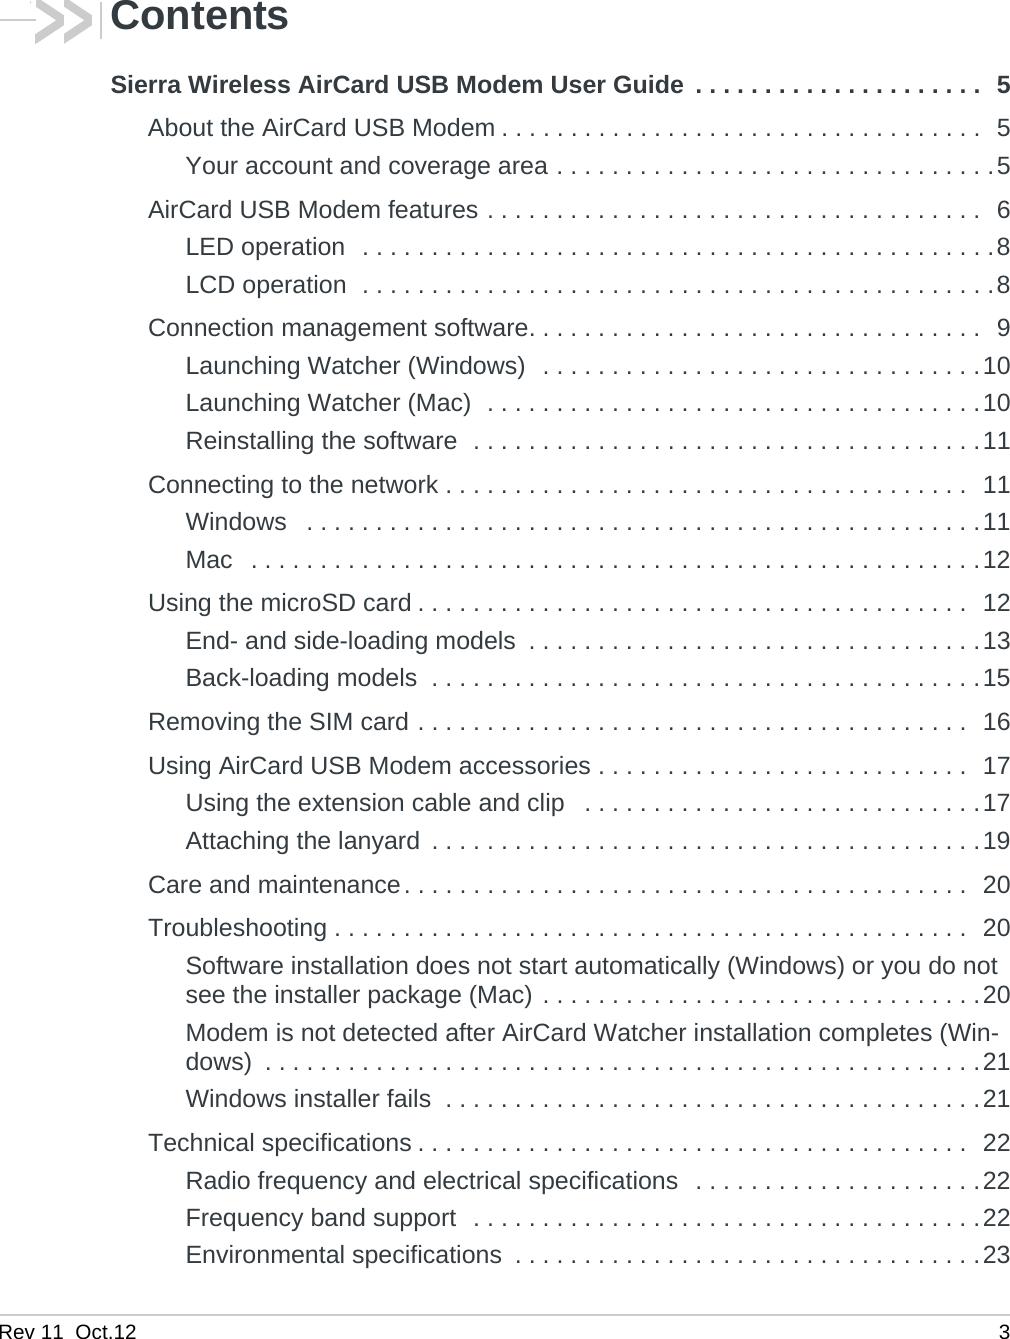 Sierra Wireless Ac340u Gsm Umts Lte Usb Modem User Manual Gps Module Schematics Rev11 Rev 11 Oct12 3contentssierra Aircard Guide